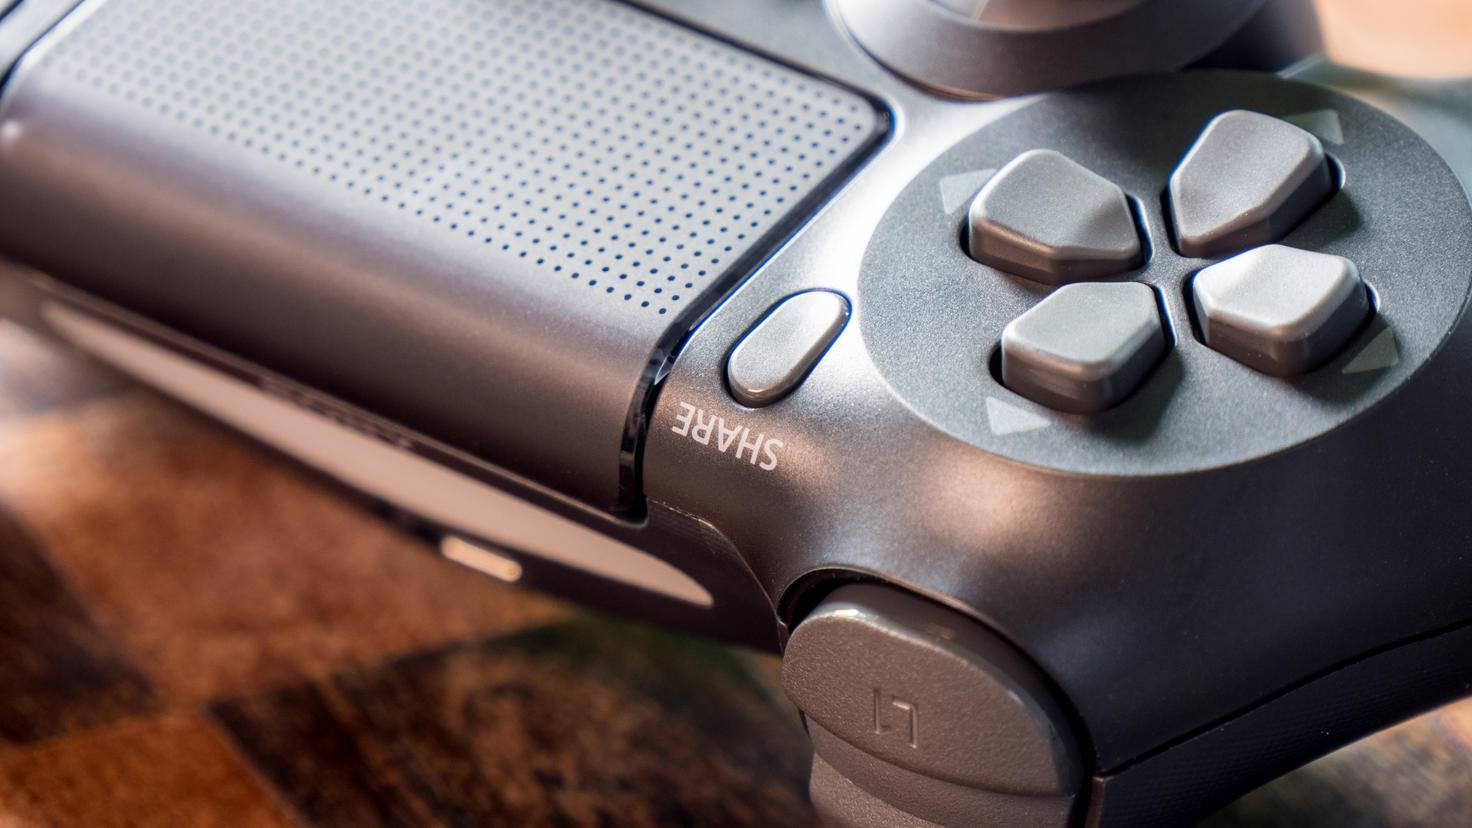 PlayStation 4 Slim PS4 Slim Controller